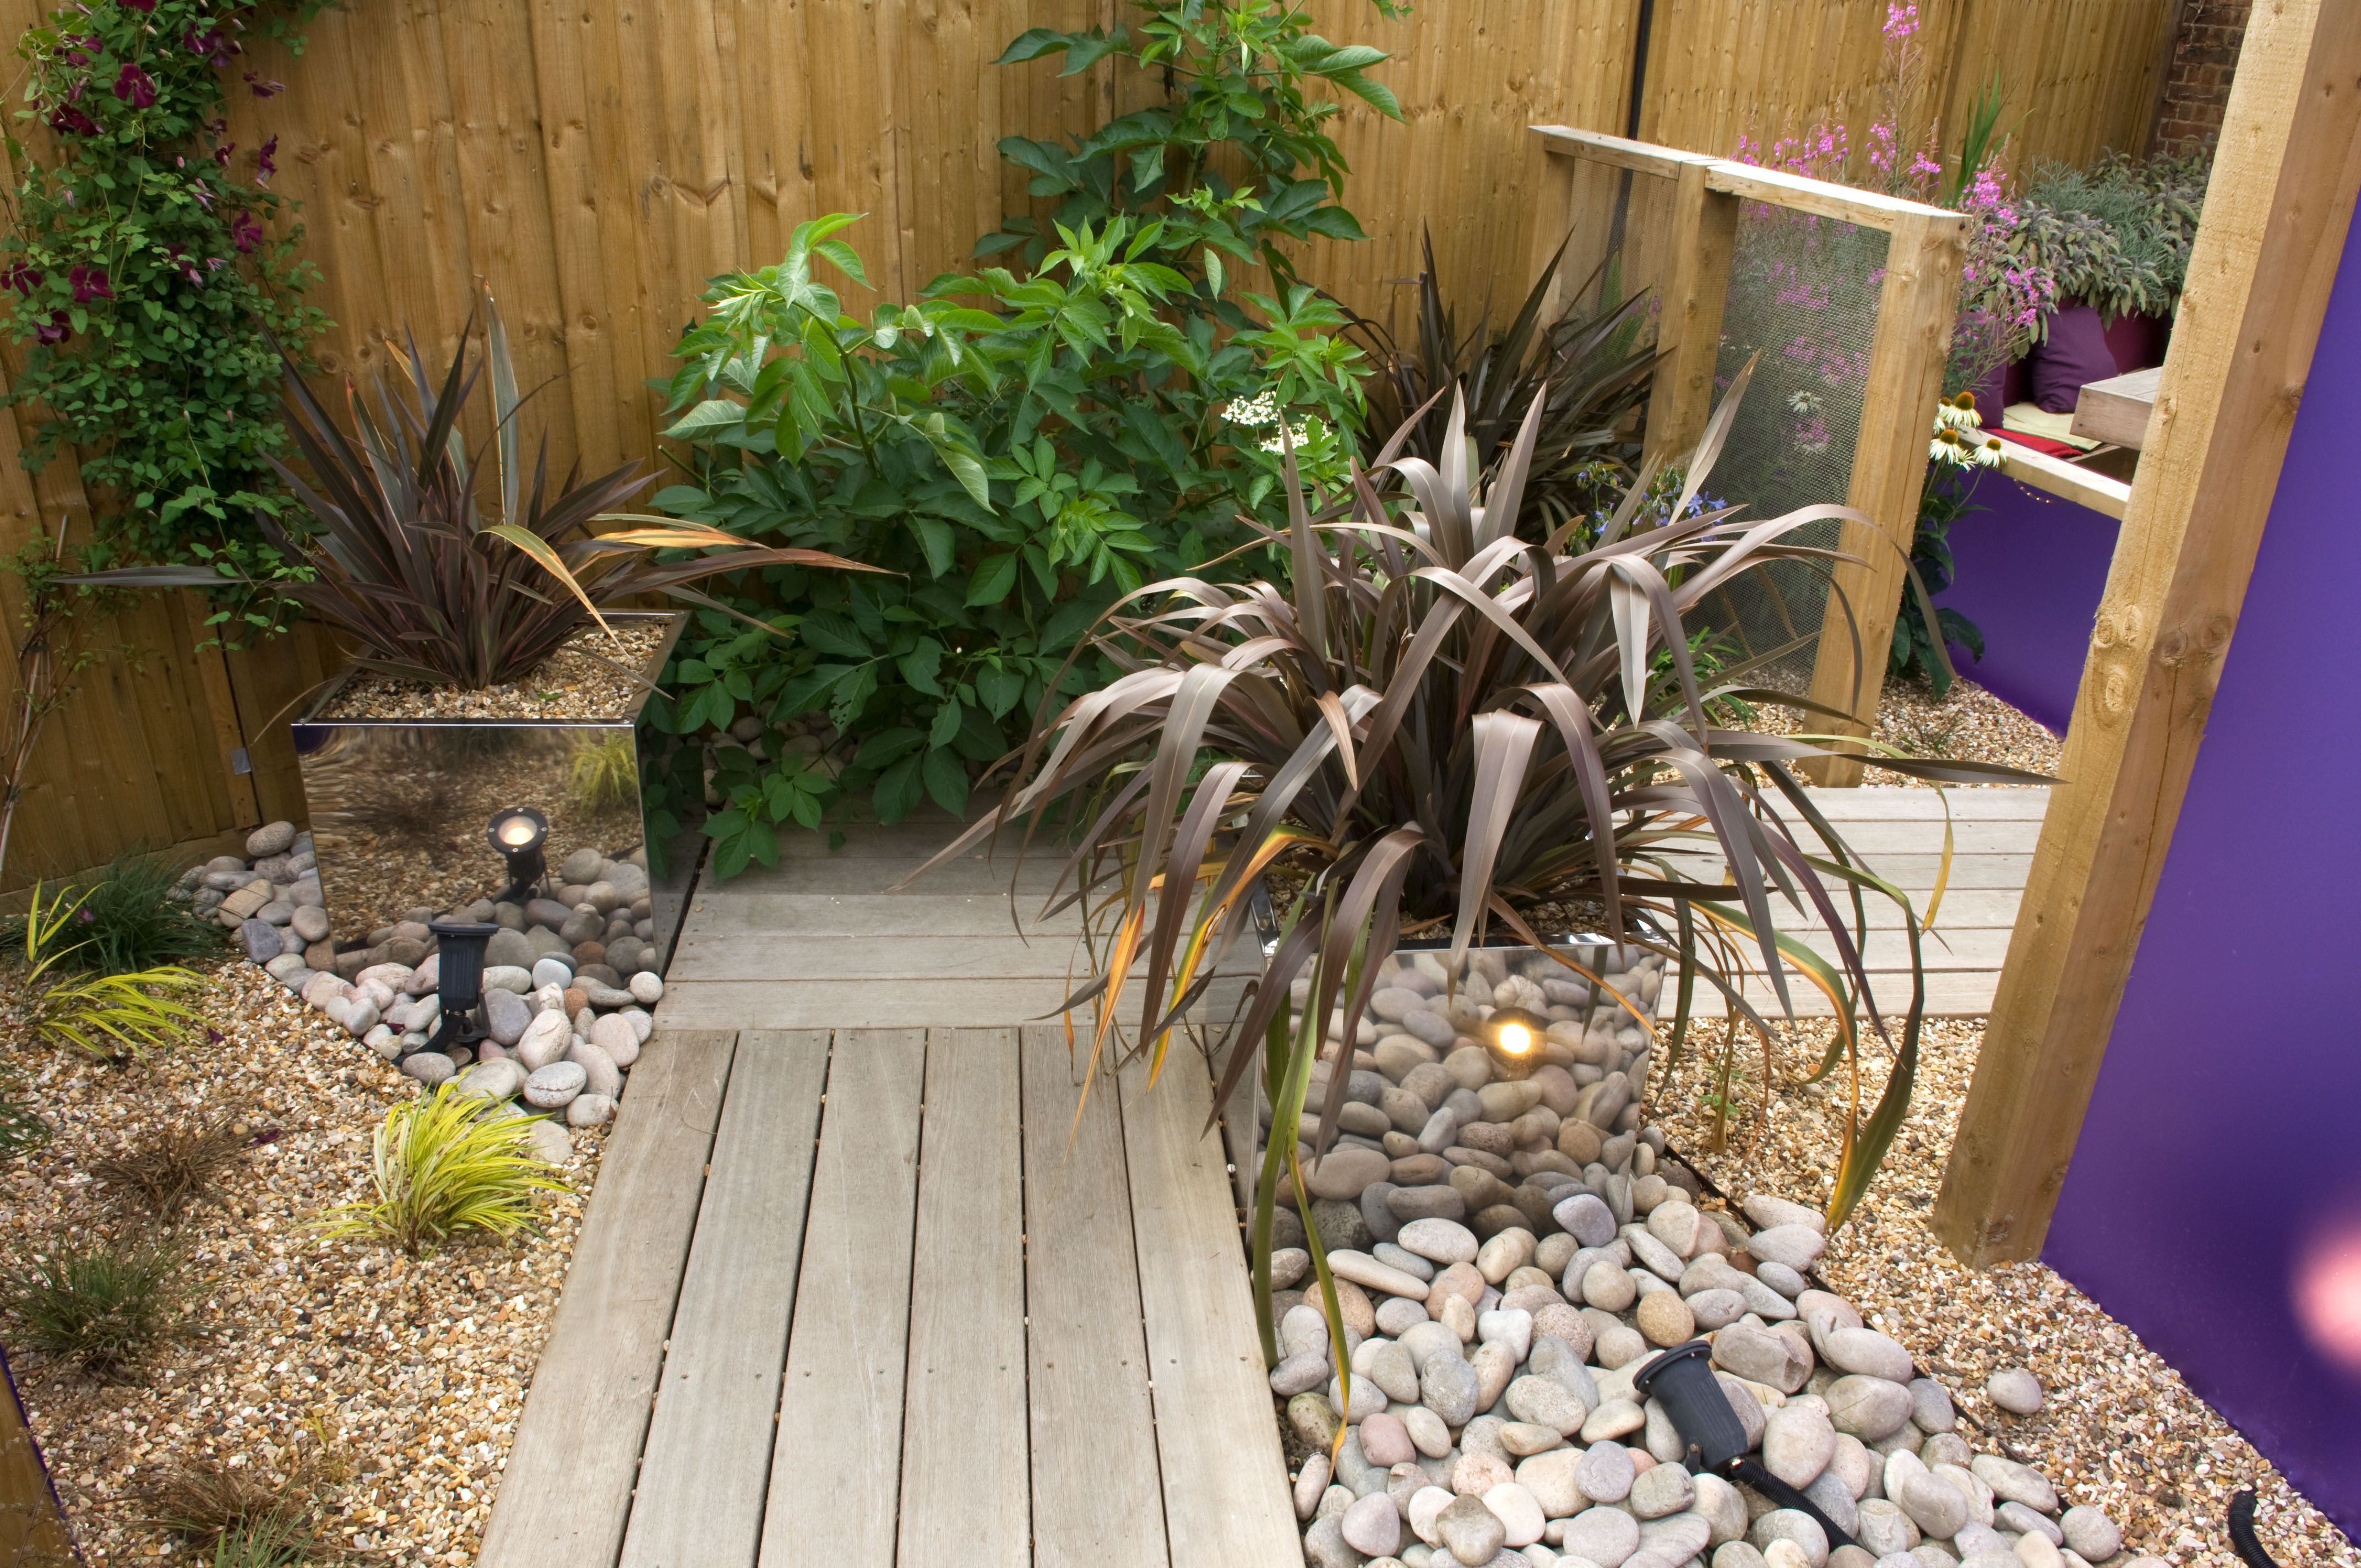 Garden Design In Sevenoaks Kent 01702 662962 Garden Design Contemporary Garden Design Contemporary Garden